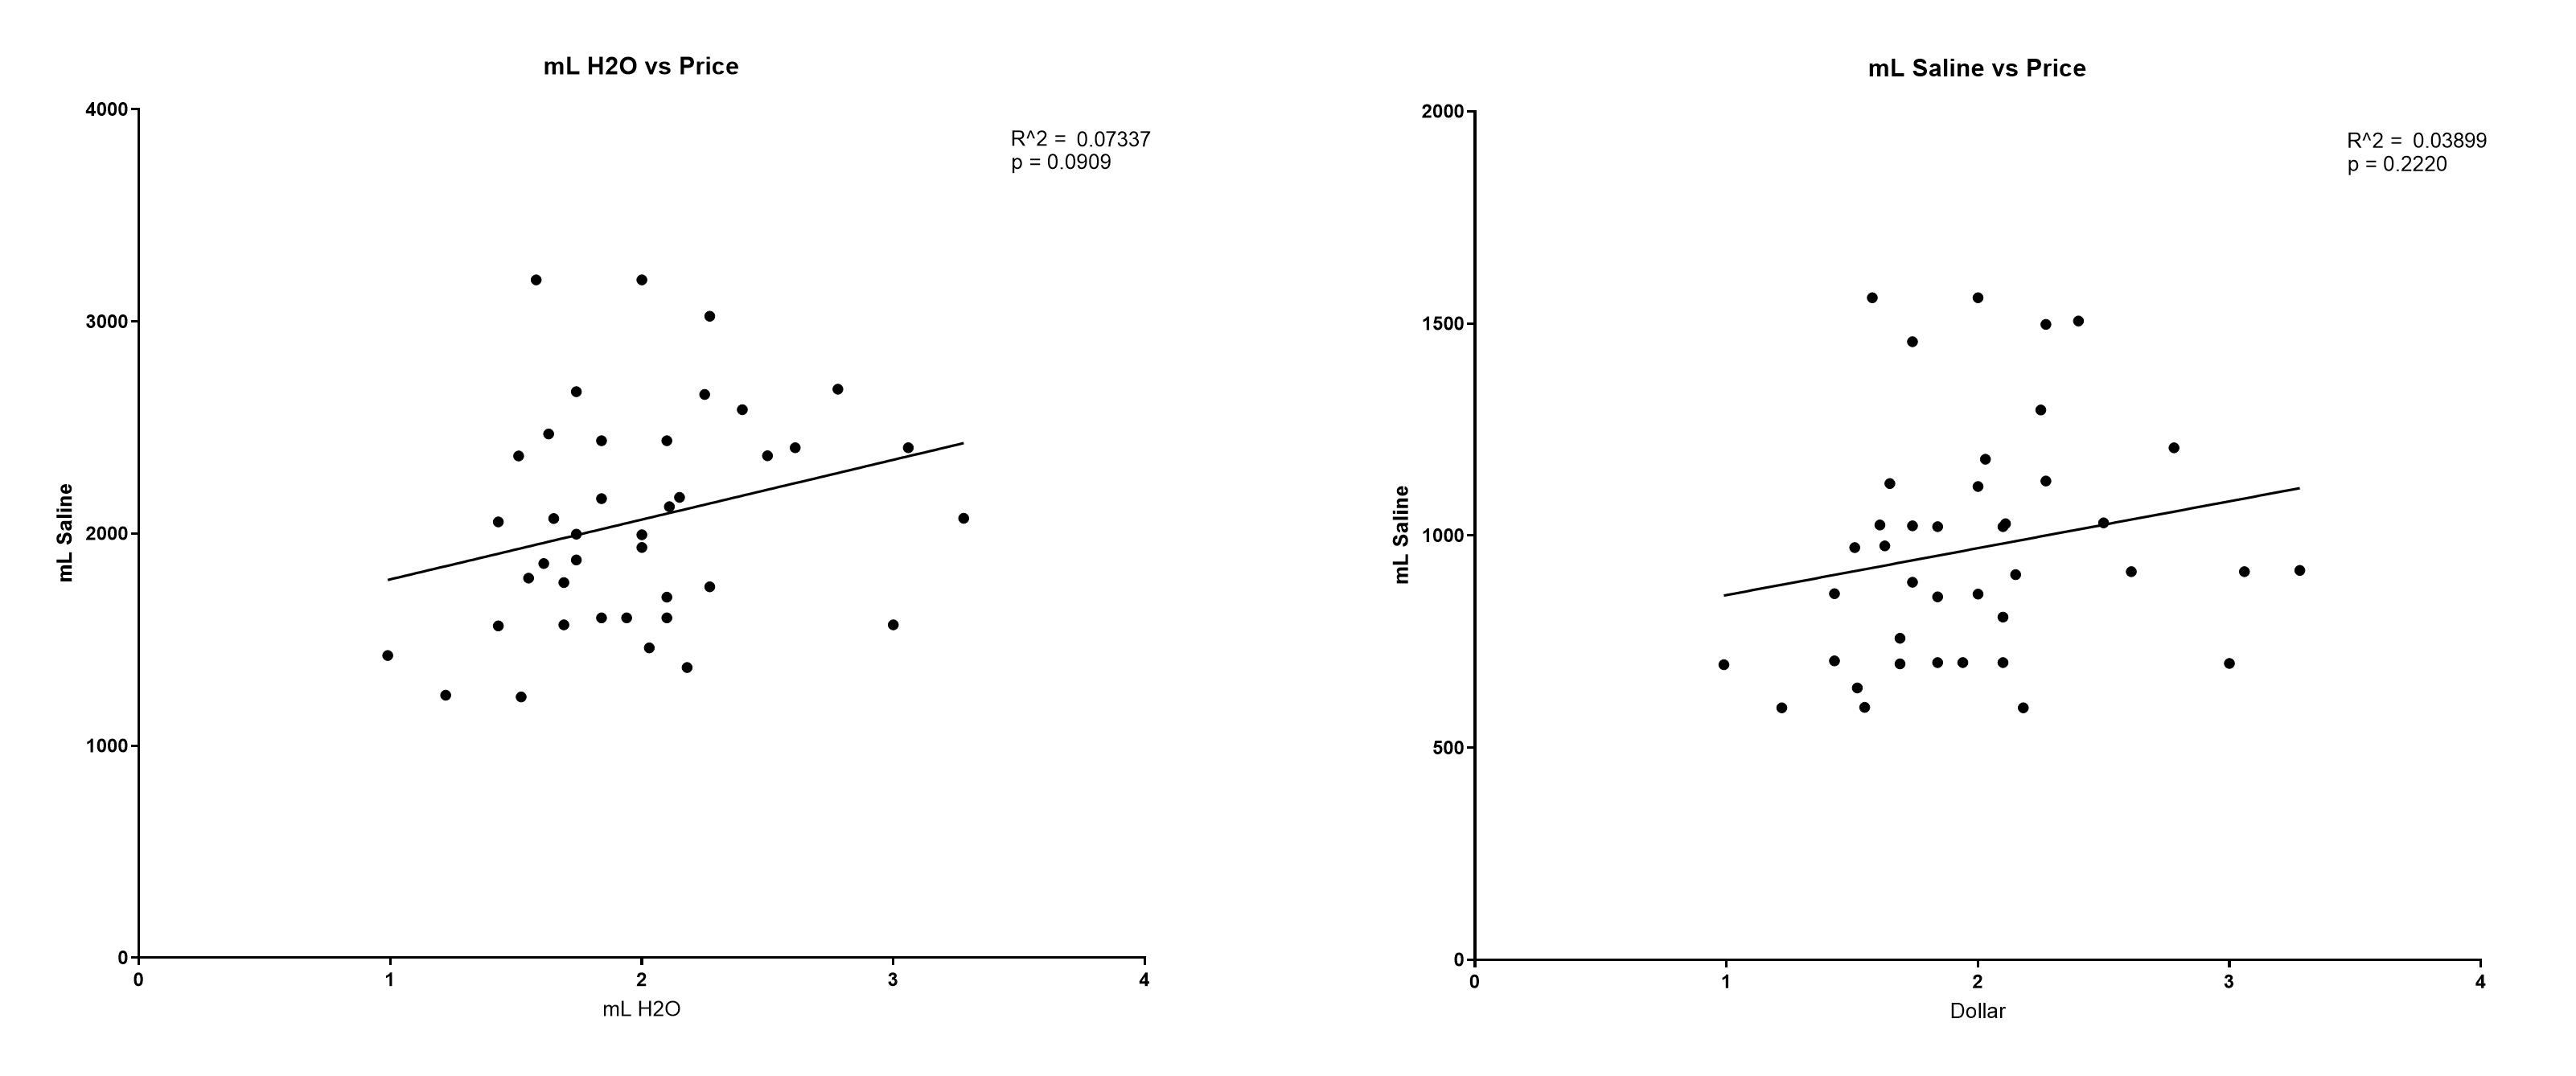 298-6-LowPriceCorrelation.png